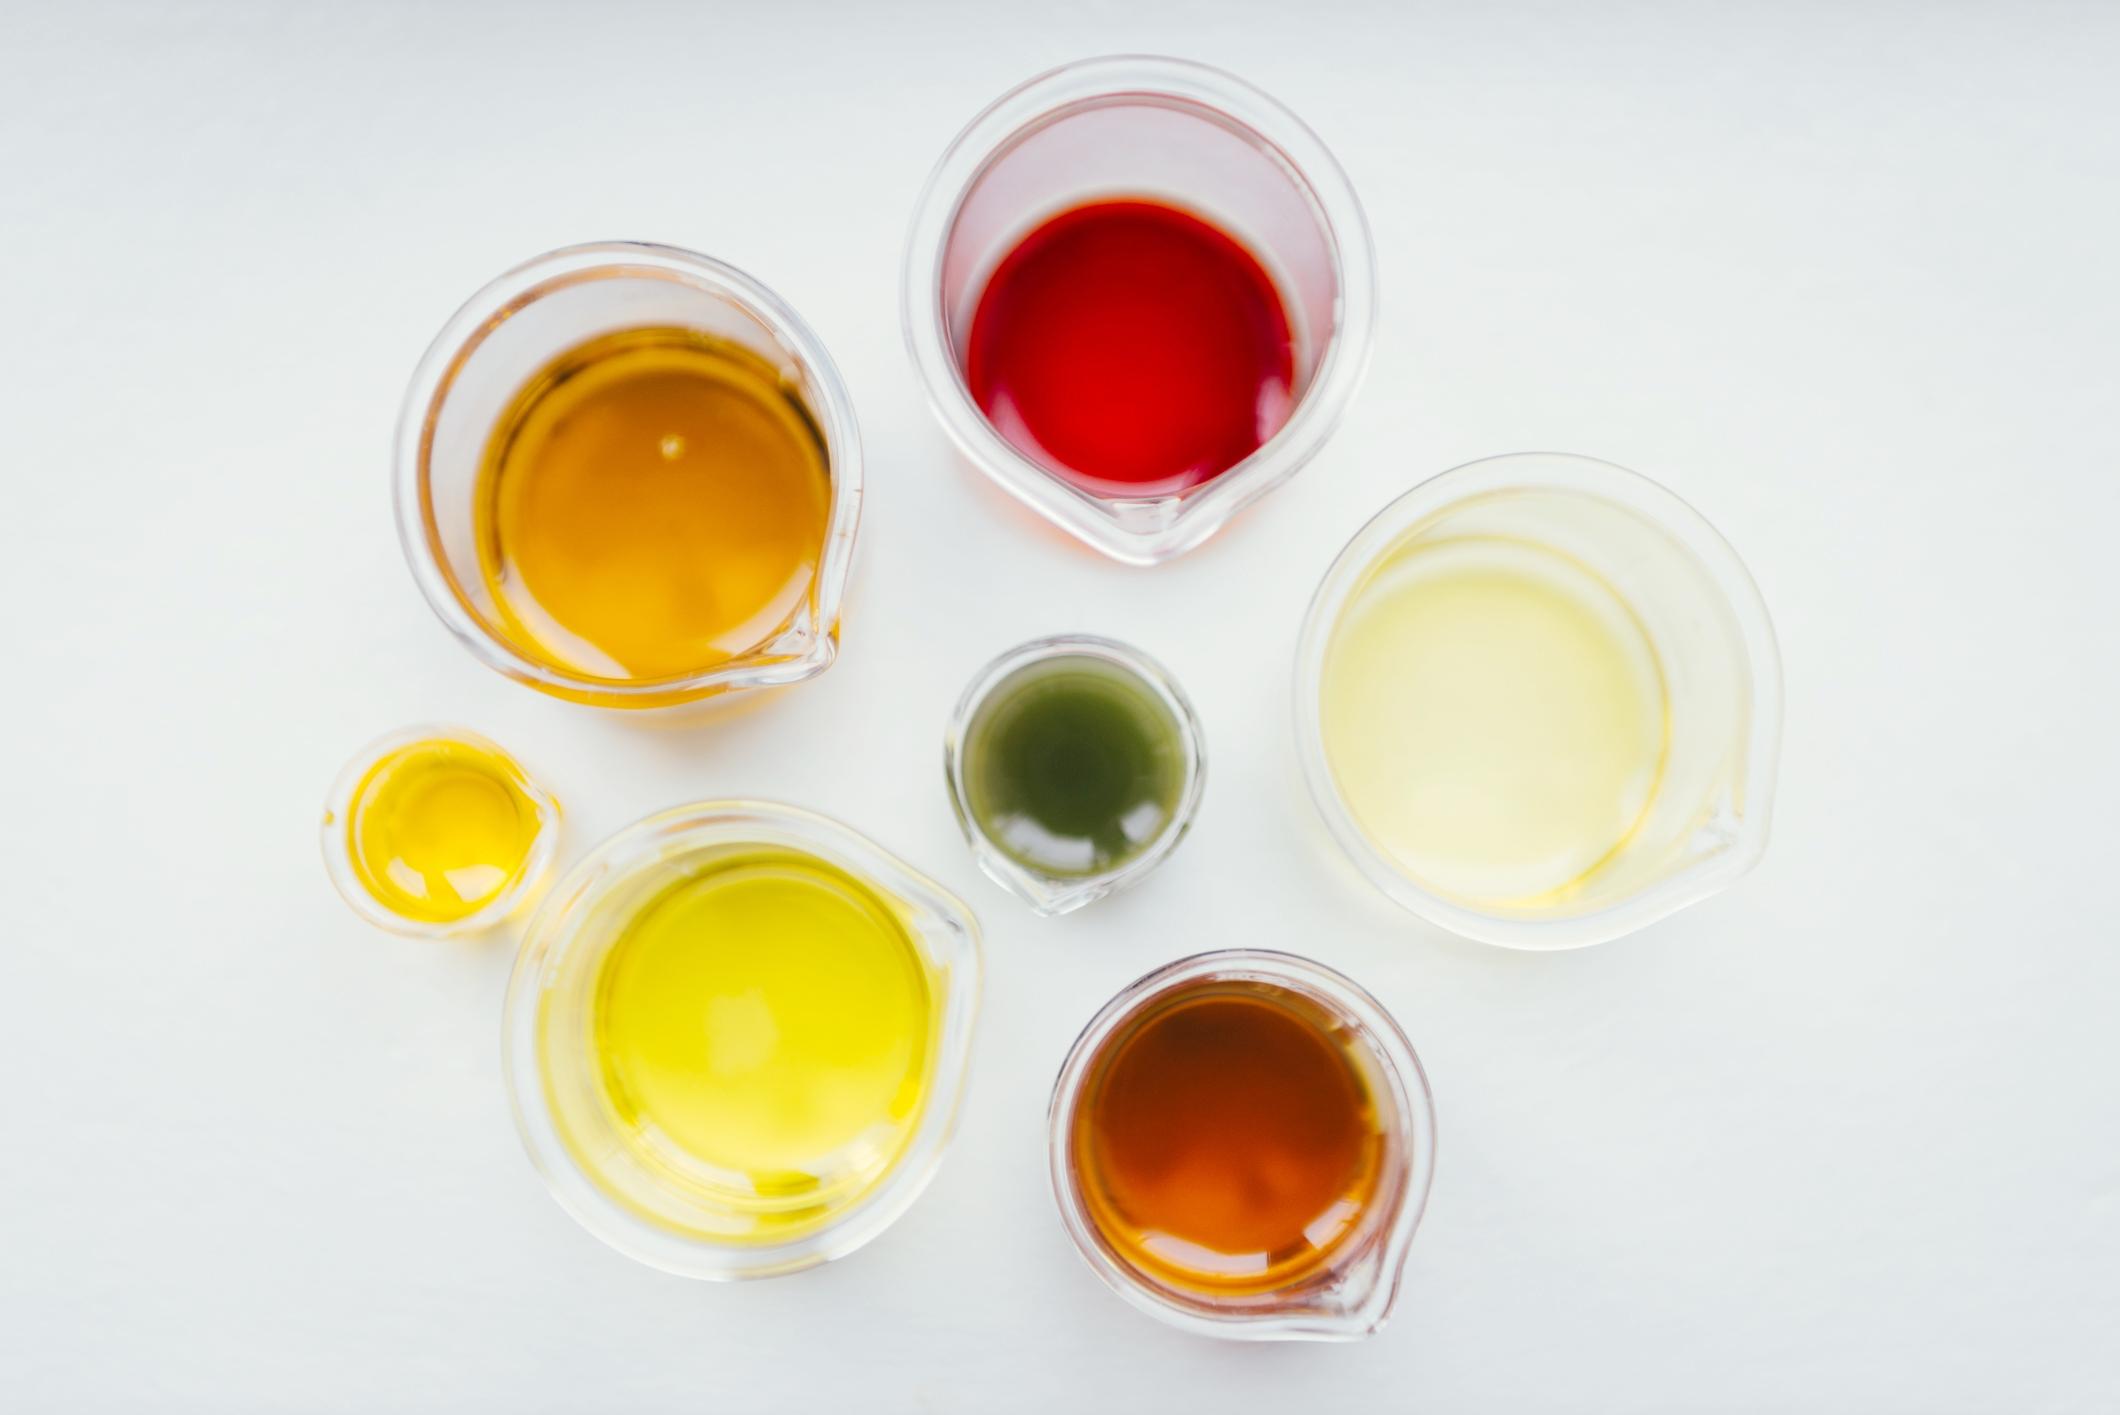 Testing and mixing various potions